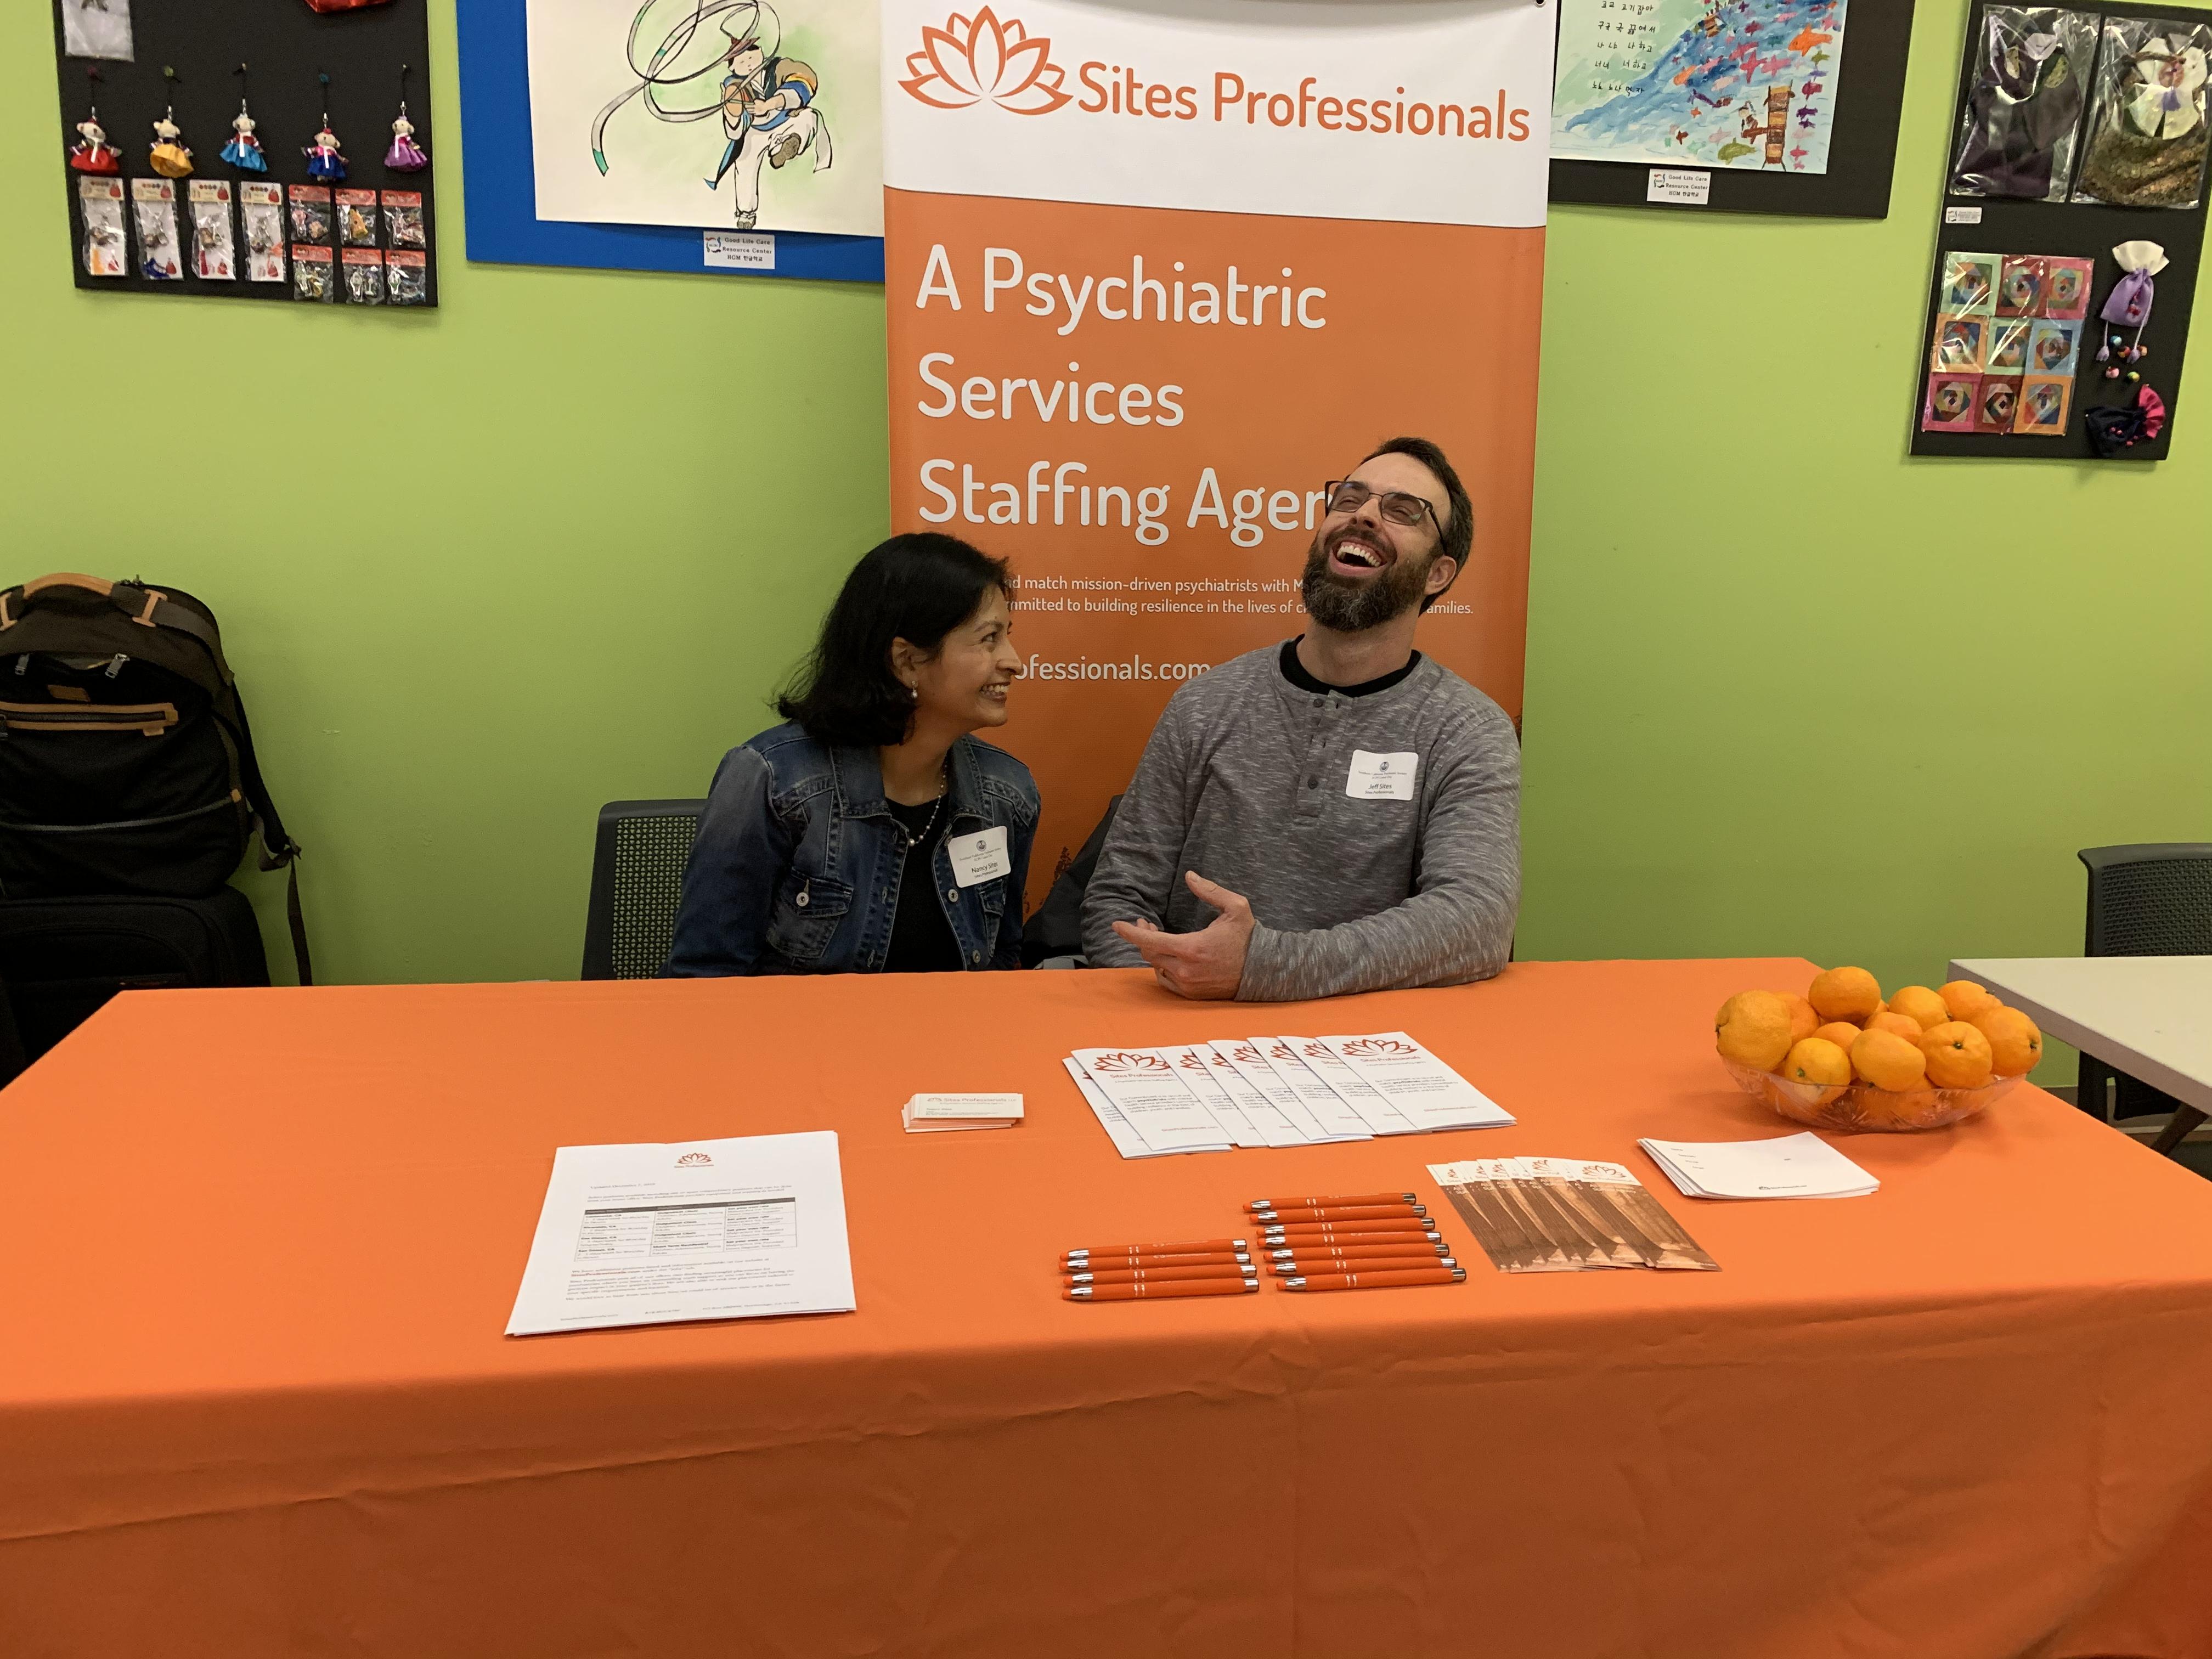 Psychiatrist Staffing Services Sites Professionals